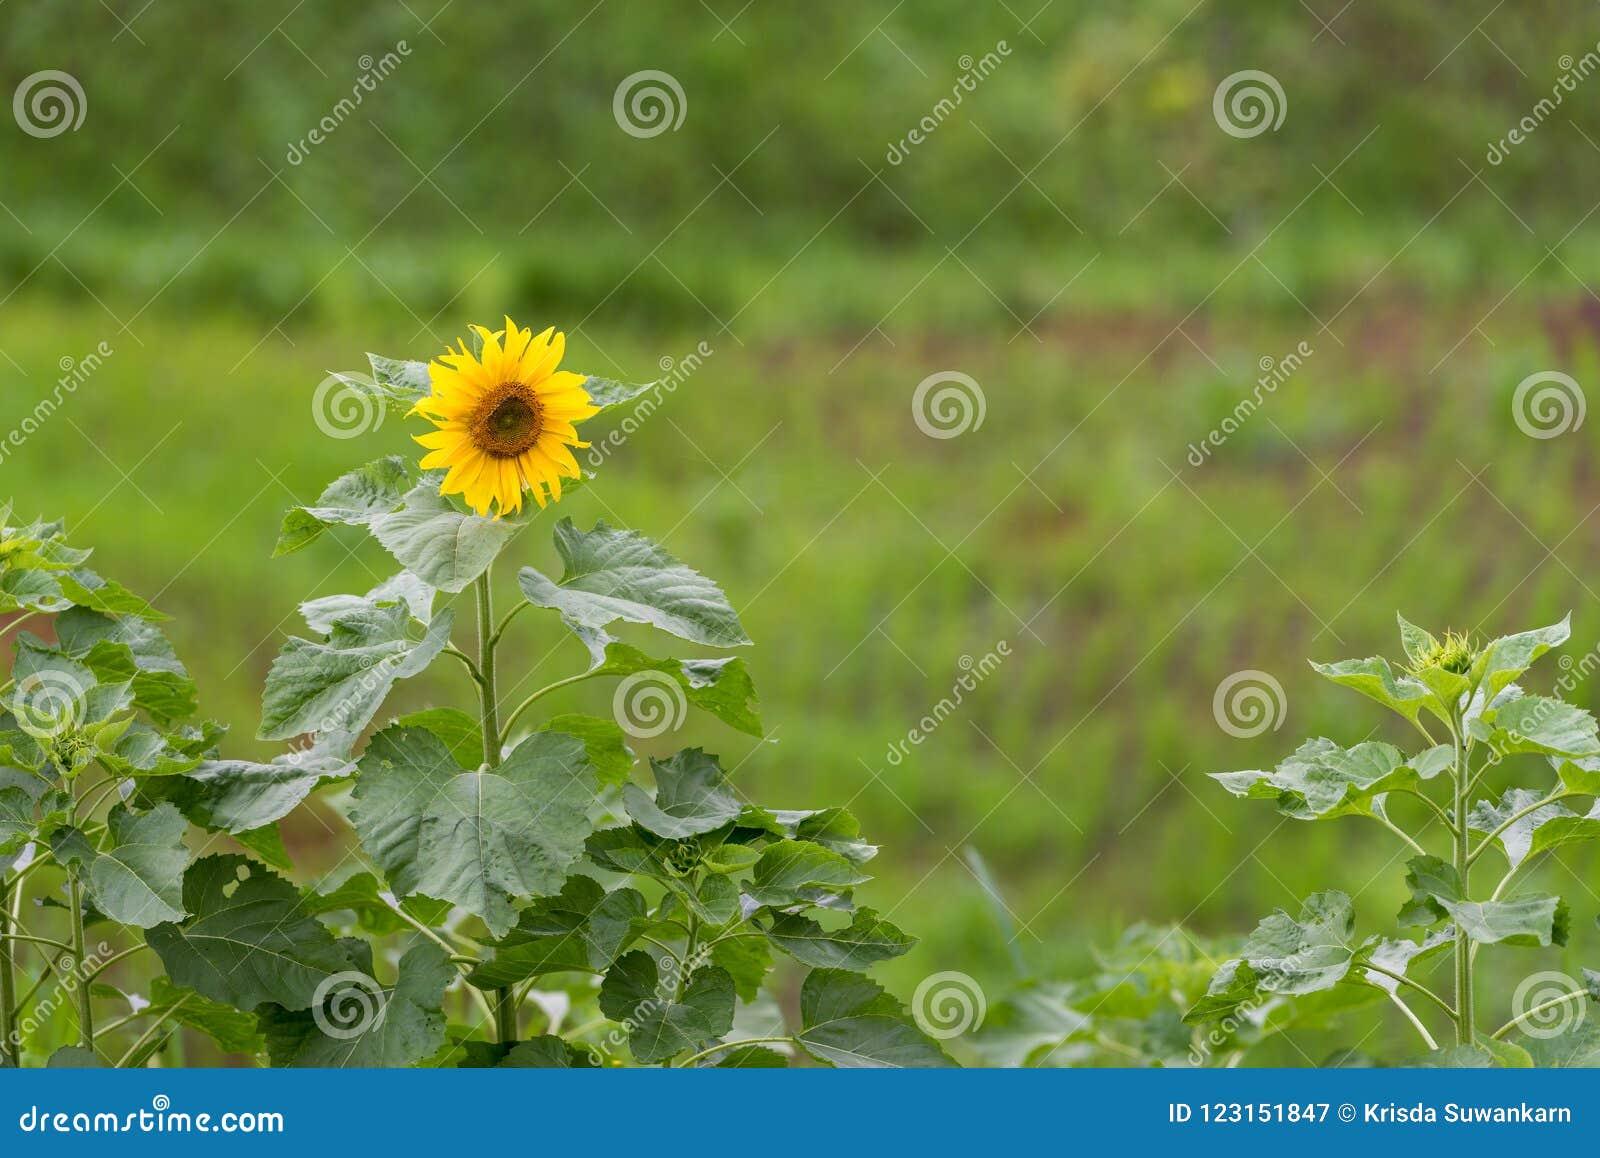 Sunflowers field with single flower